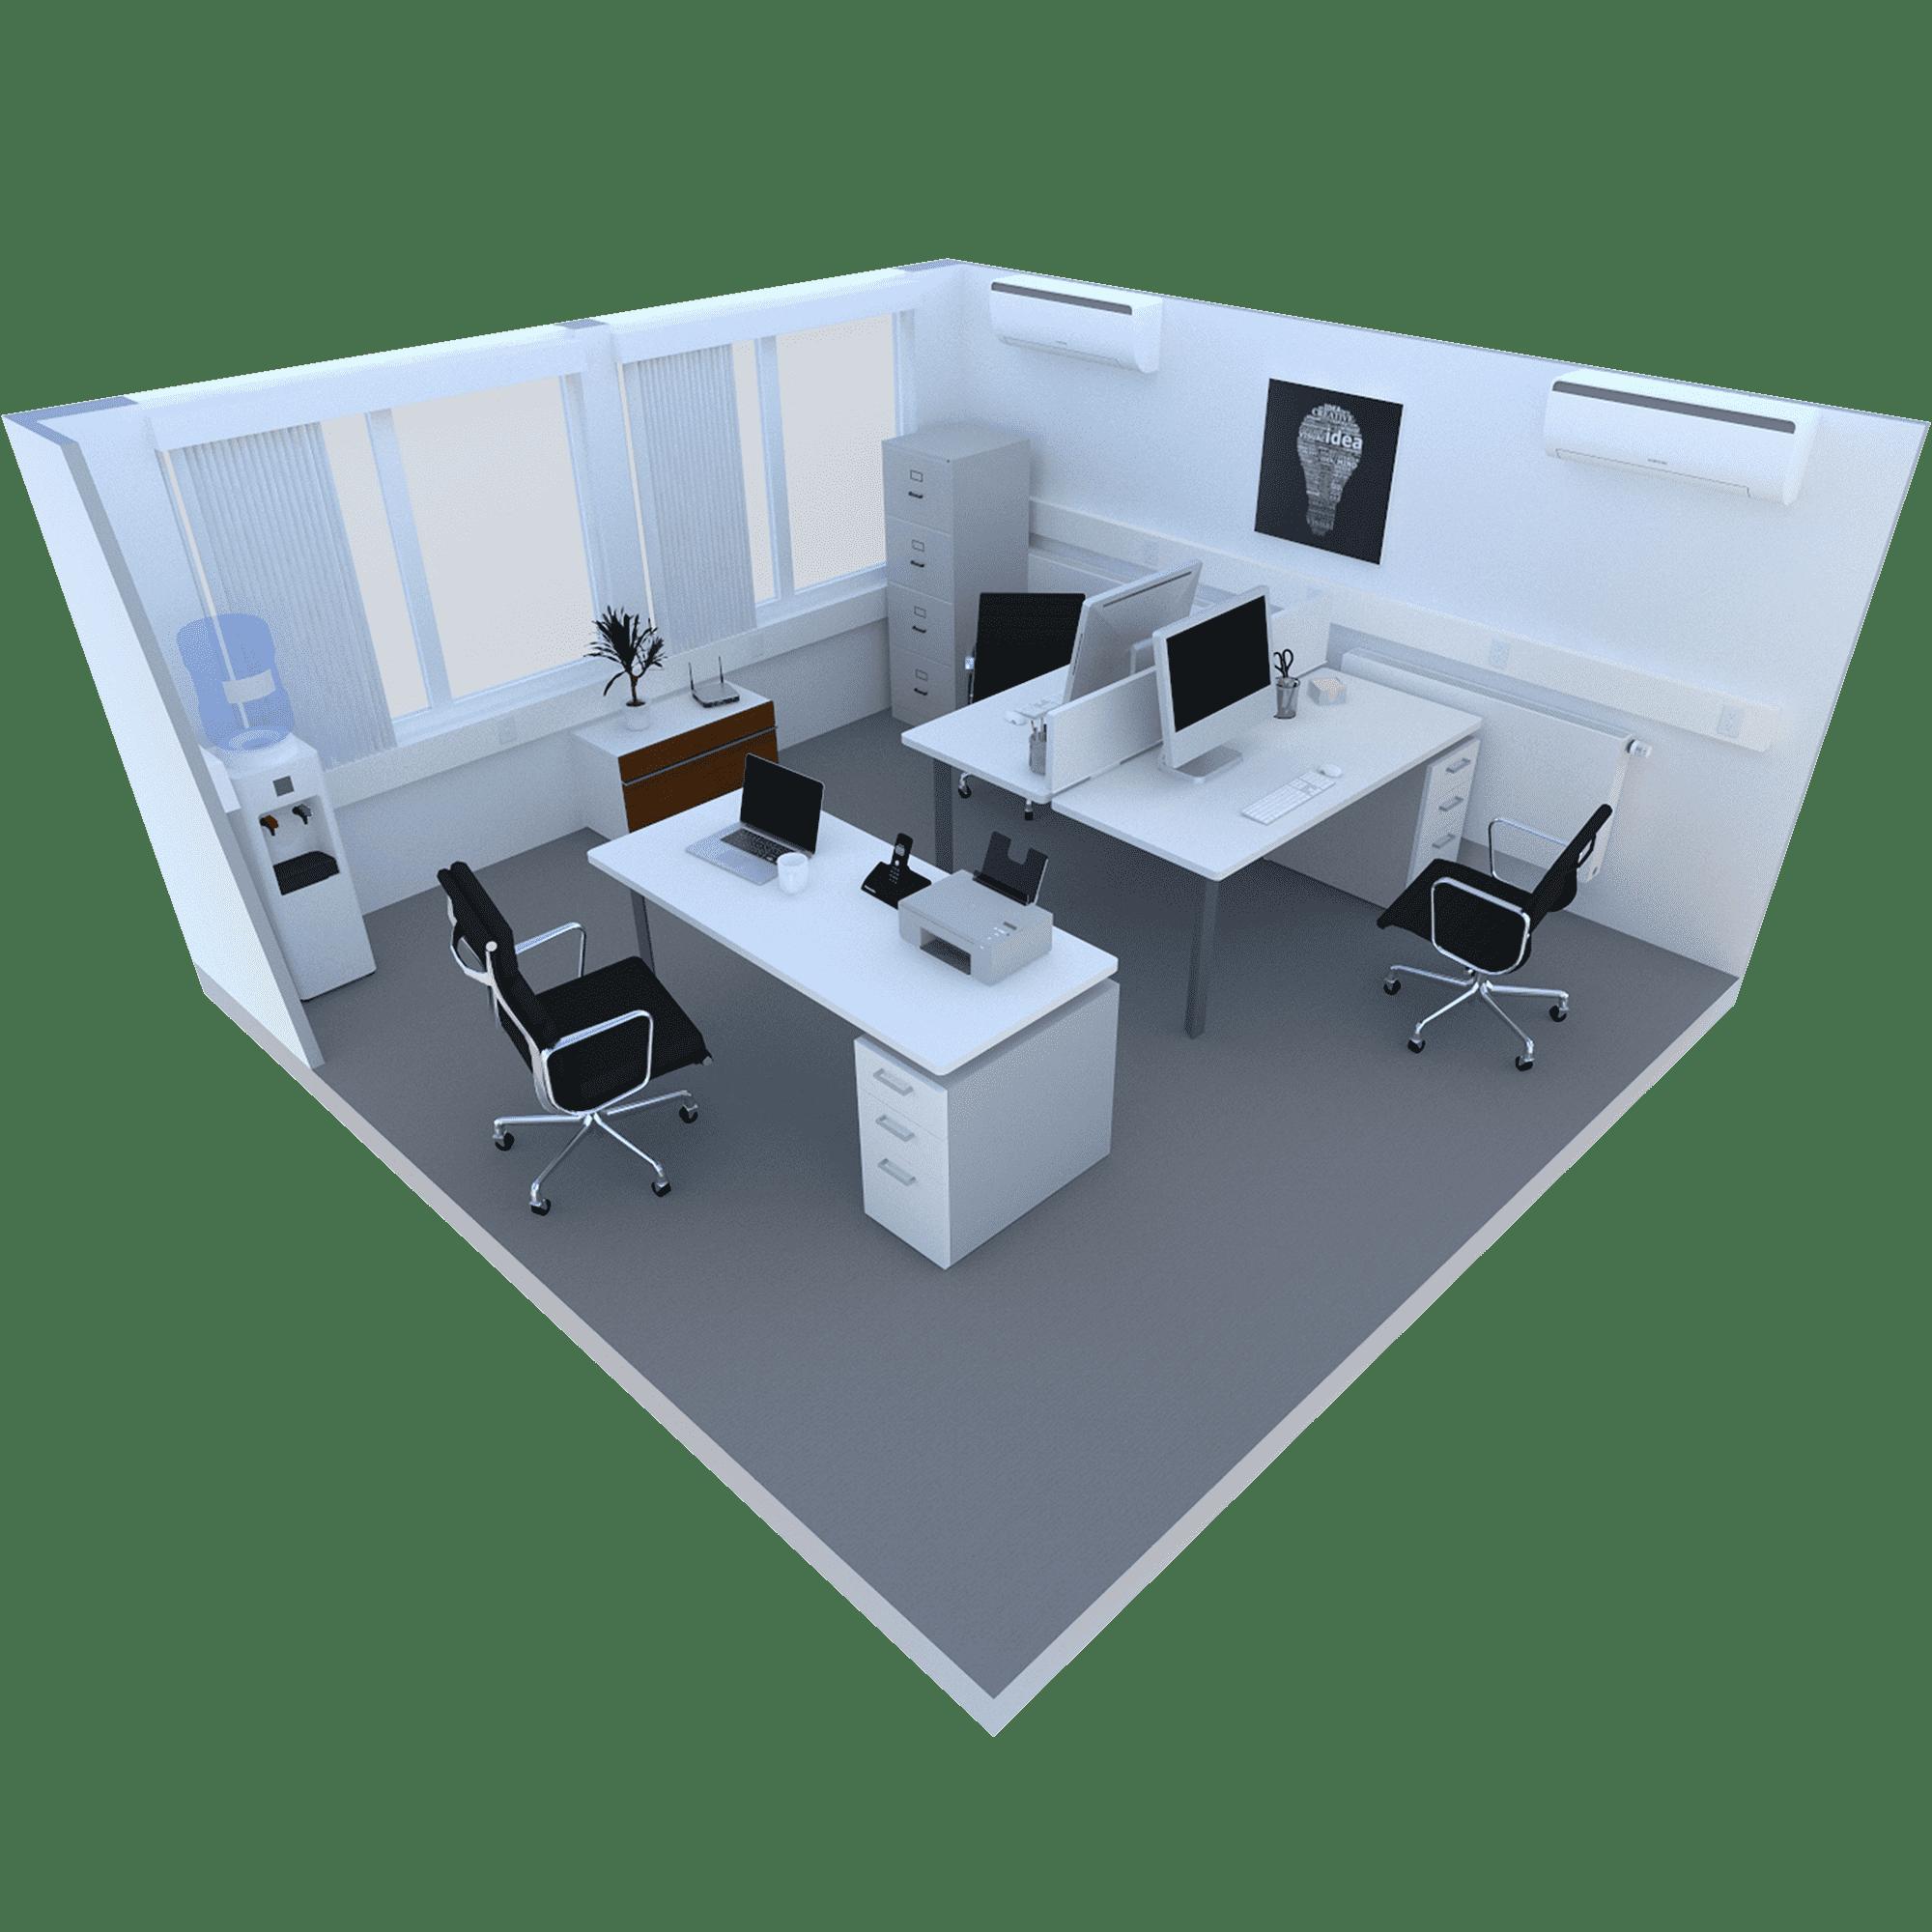 200 Sq ft Room